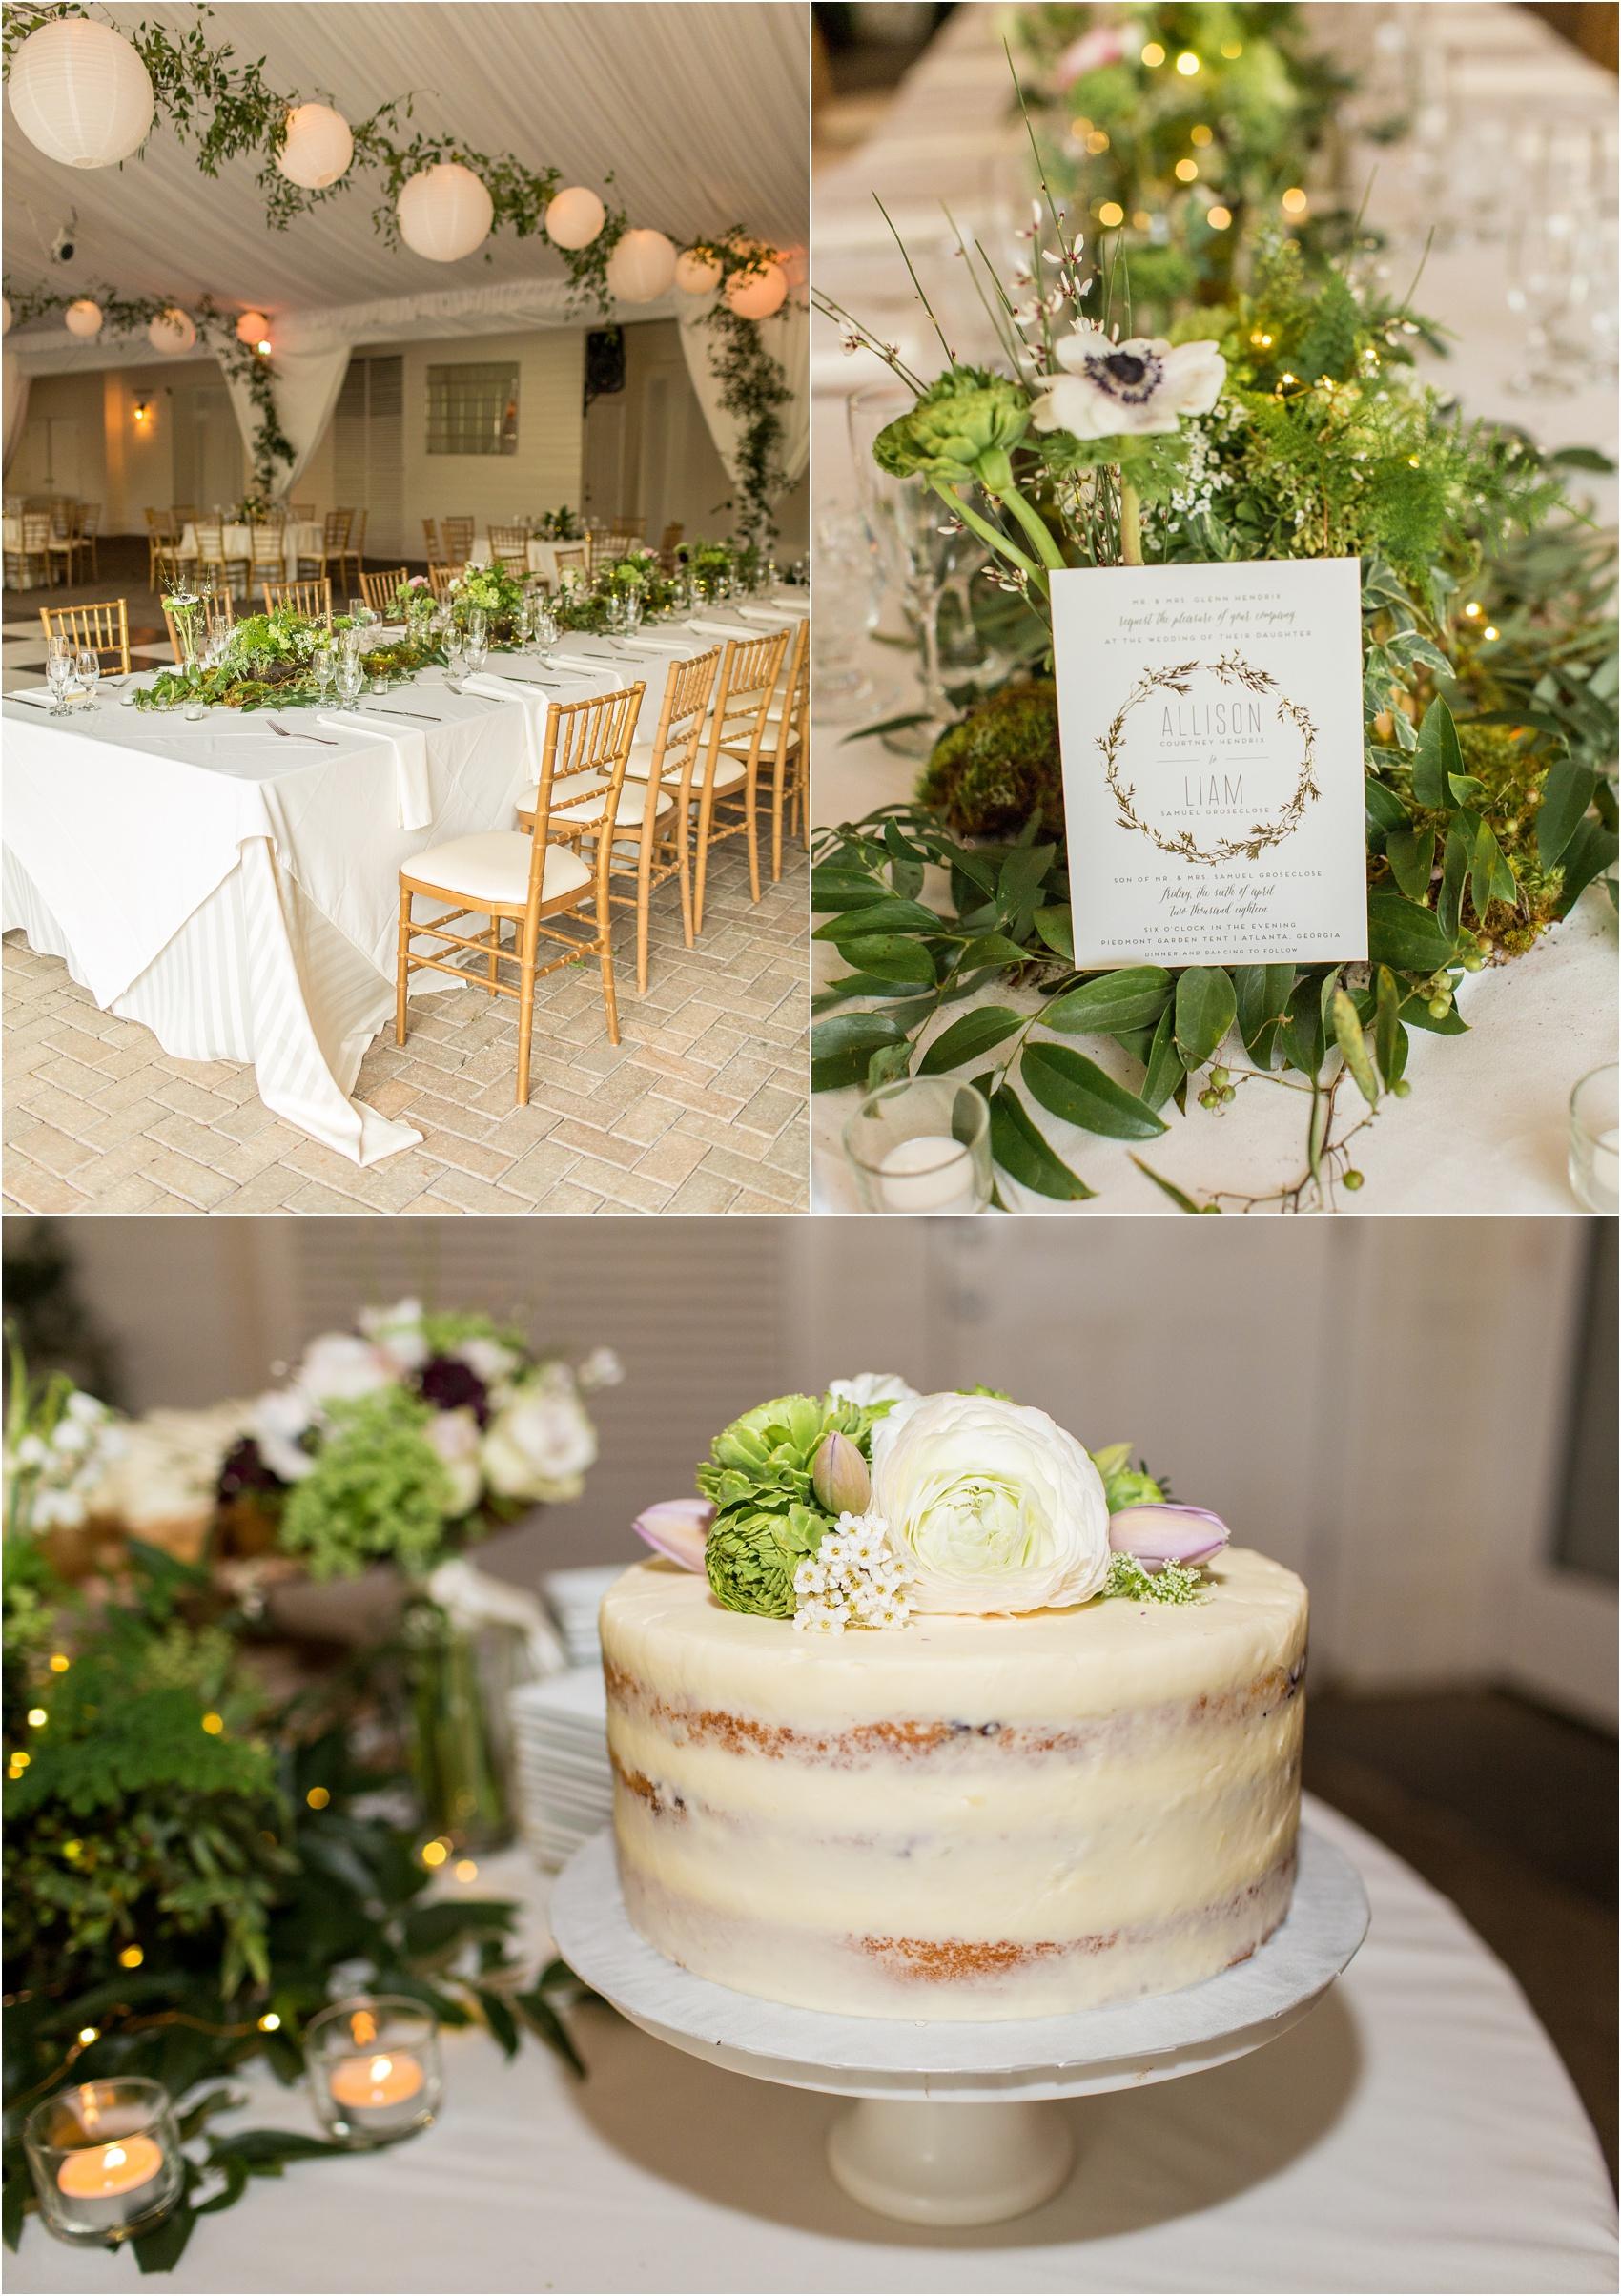 Savannah Eve Photography- Groseclose Wedding- Blog-44.jpg